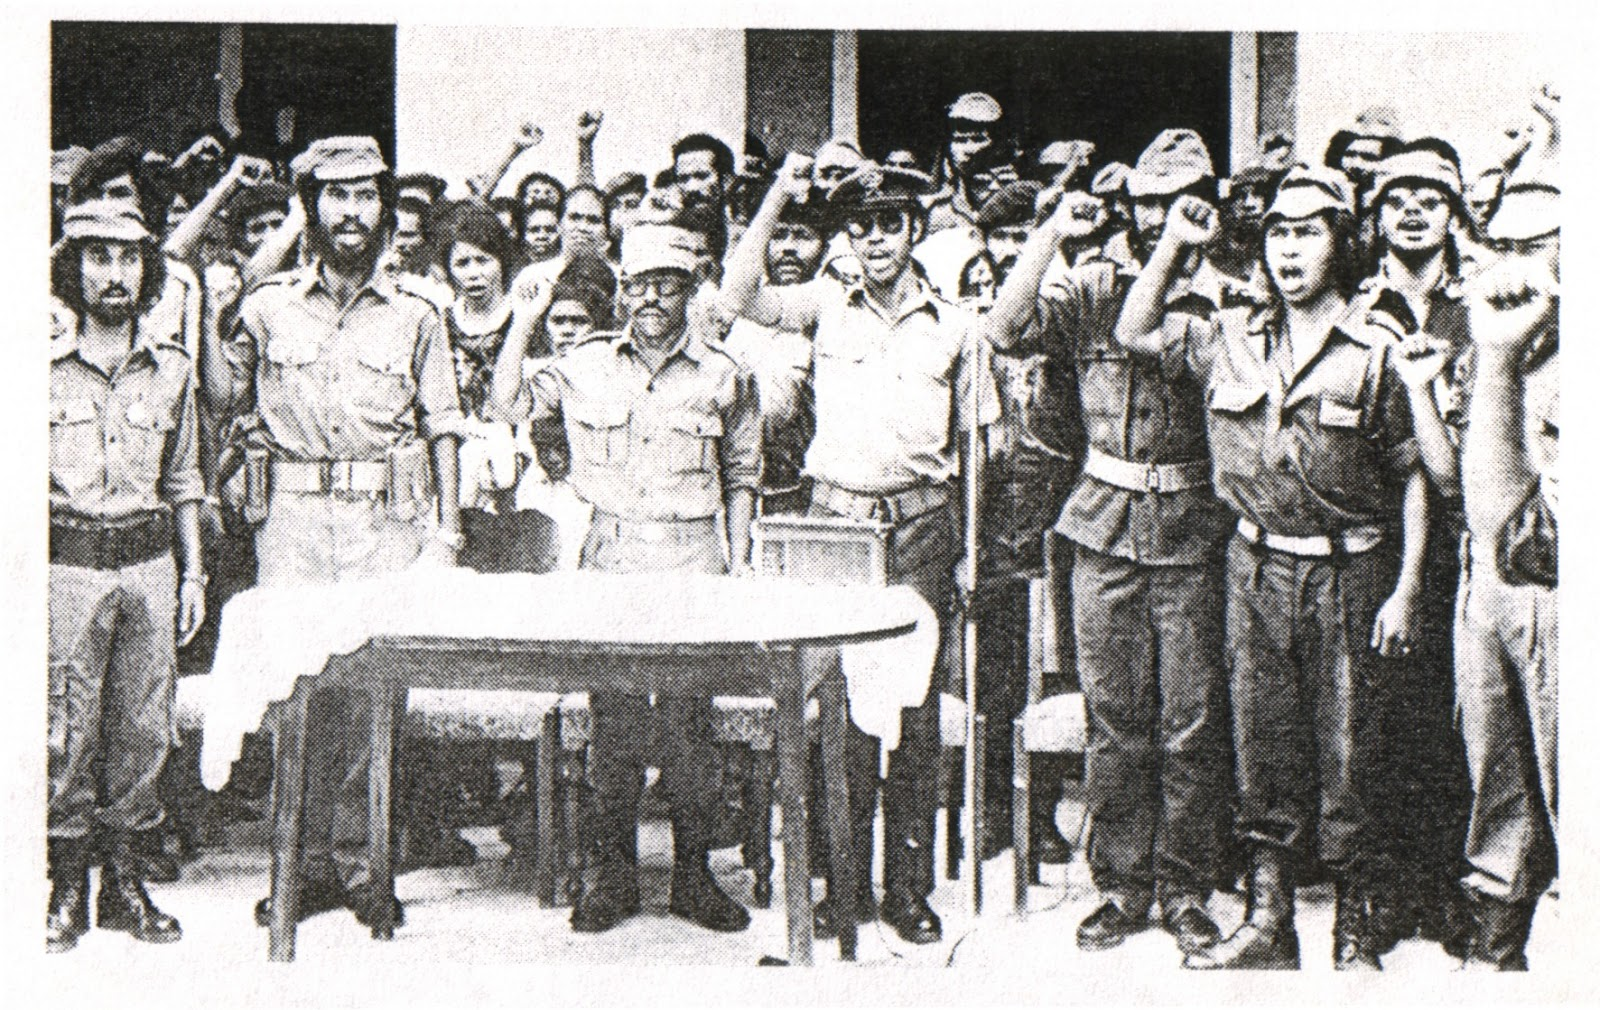 east-timor-independence-celebration-prior-to-indonesian-invasion-timor-leste-1975